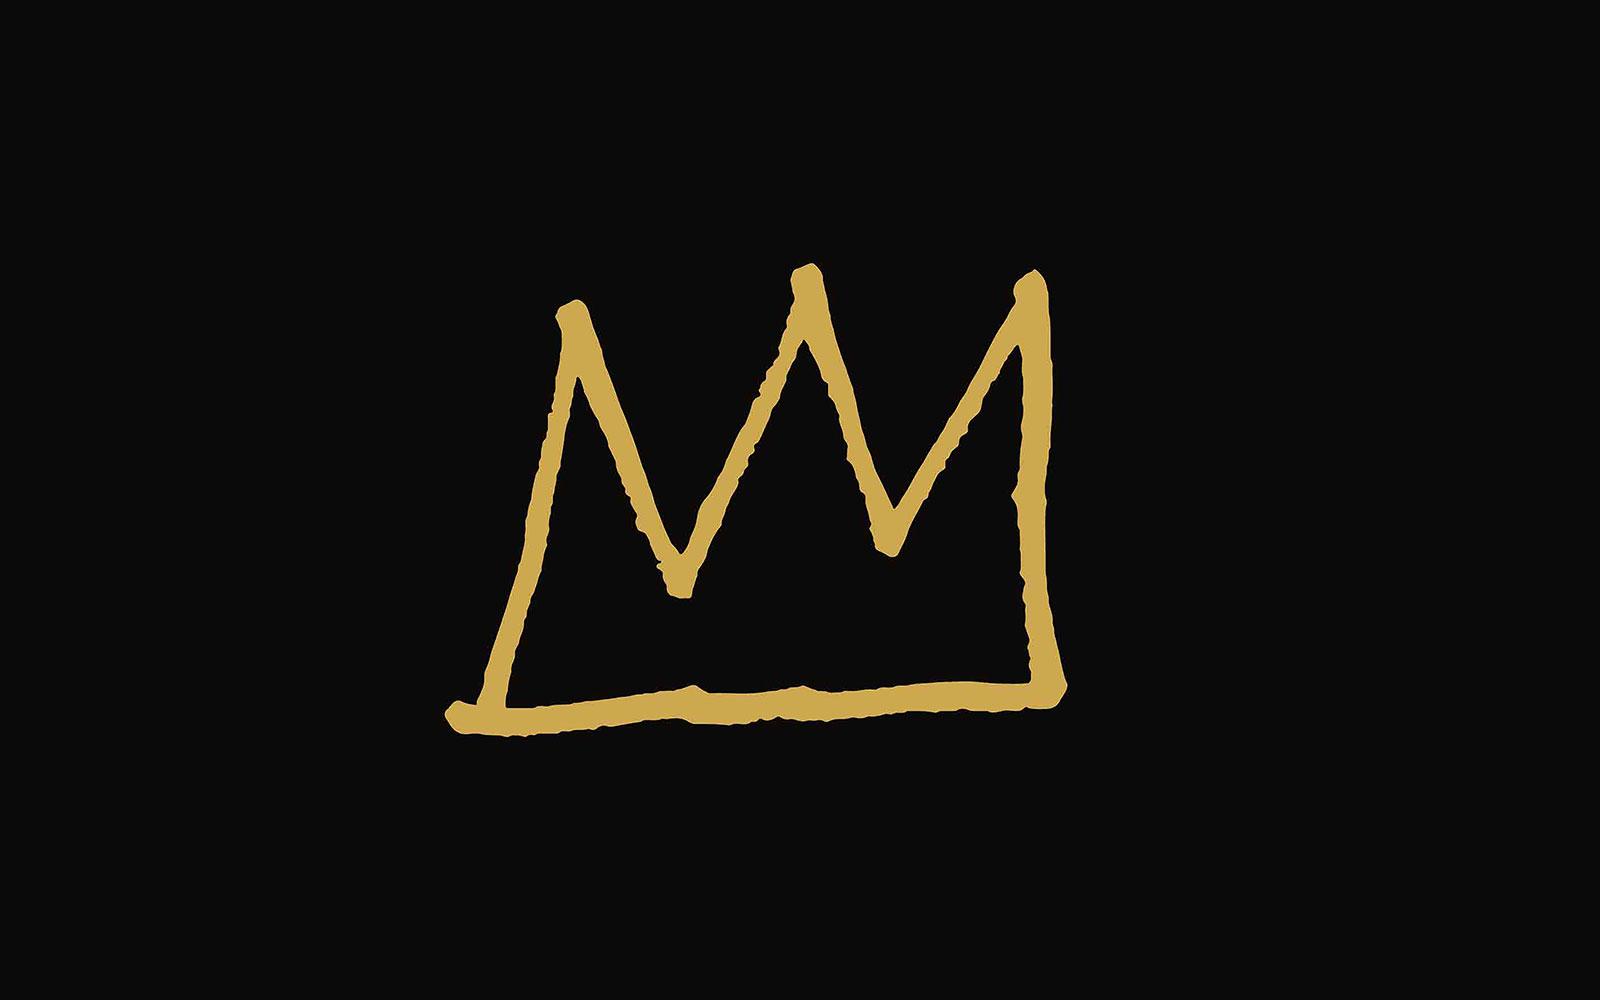 The Disquiet of Basquiat